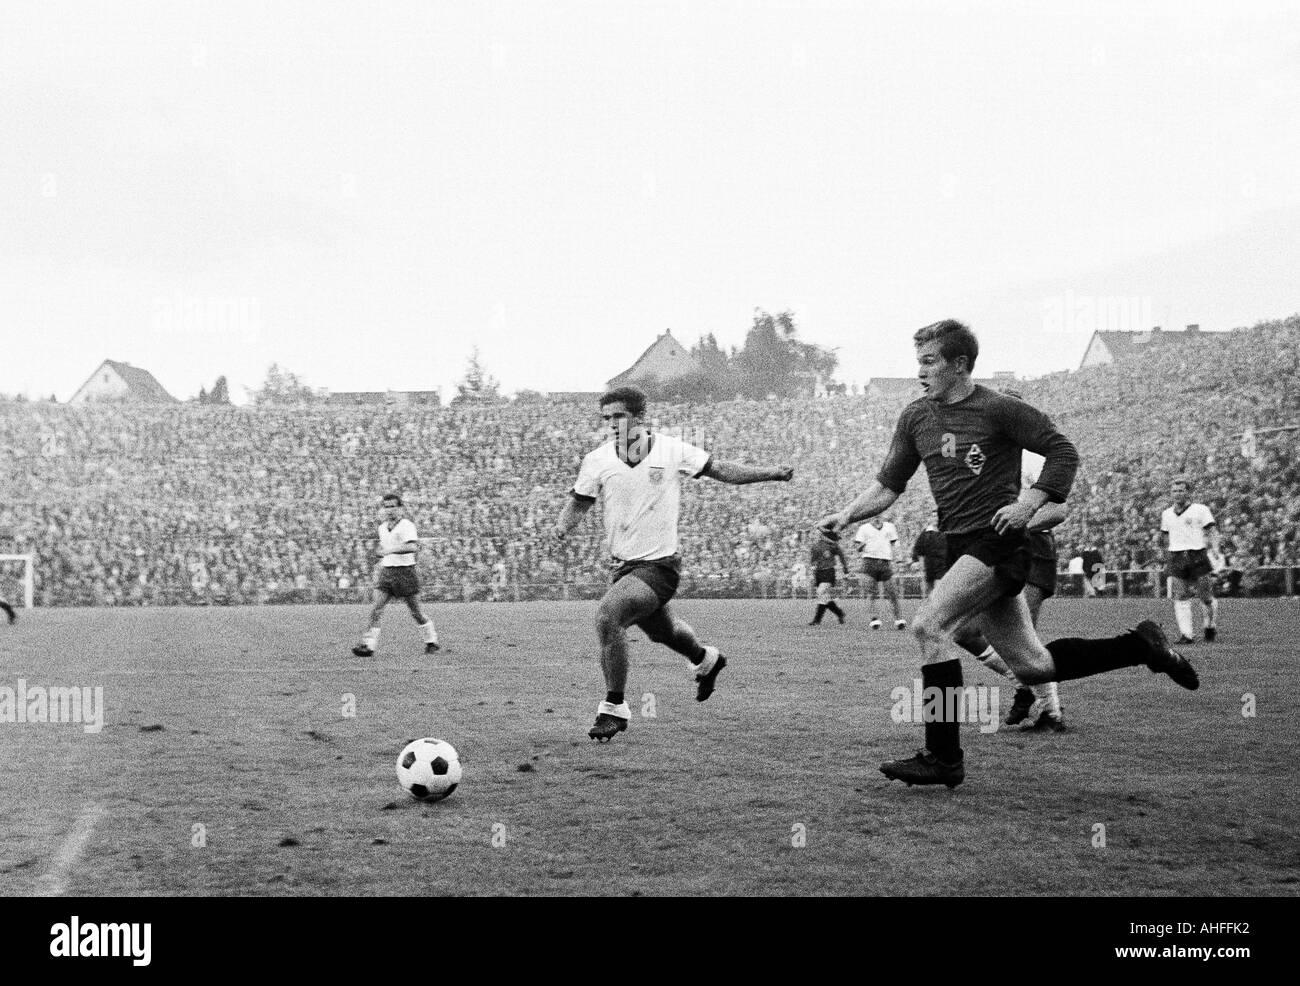 football, Bundesliga, 1965/1966, Borussia Moenchengladbach versus FC Bayern Munich 1:2, Boekelberg Stadium, scene of the match, Gerd Mueller (Munich, left) and Jupp Heynckes (MG) - Stock Image